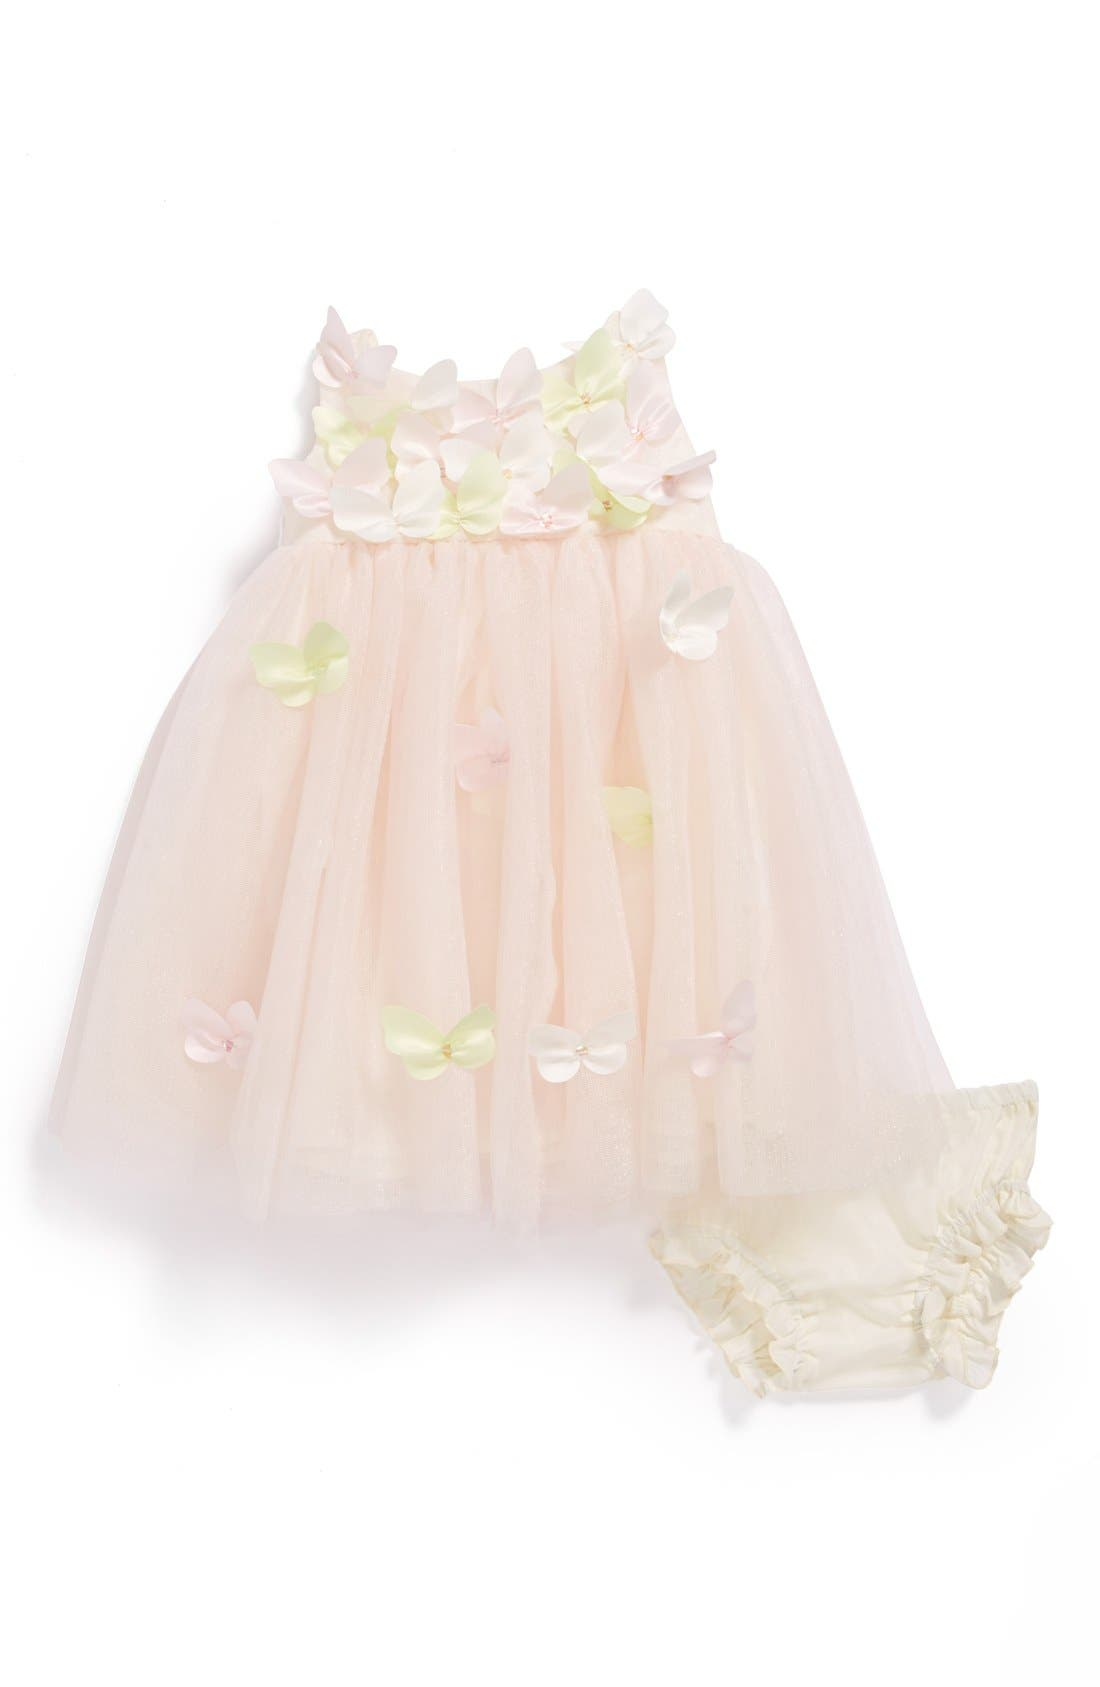 Alternate Image 1 Selected - Biscotti 'Balrina' Dress & Bloomers (Baby Girls)